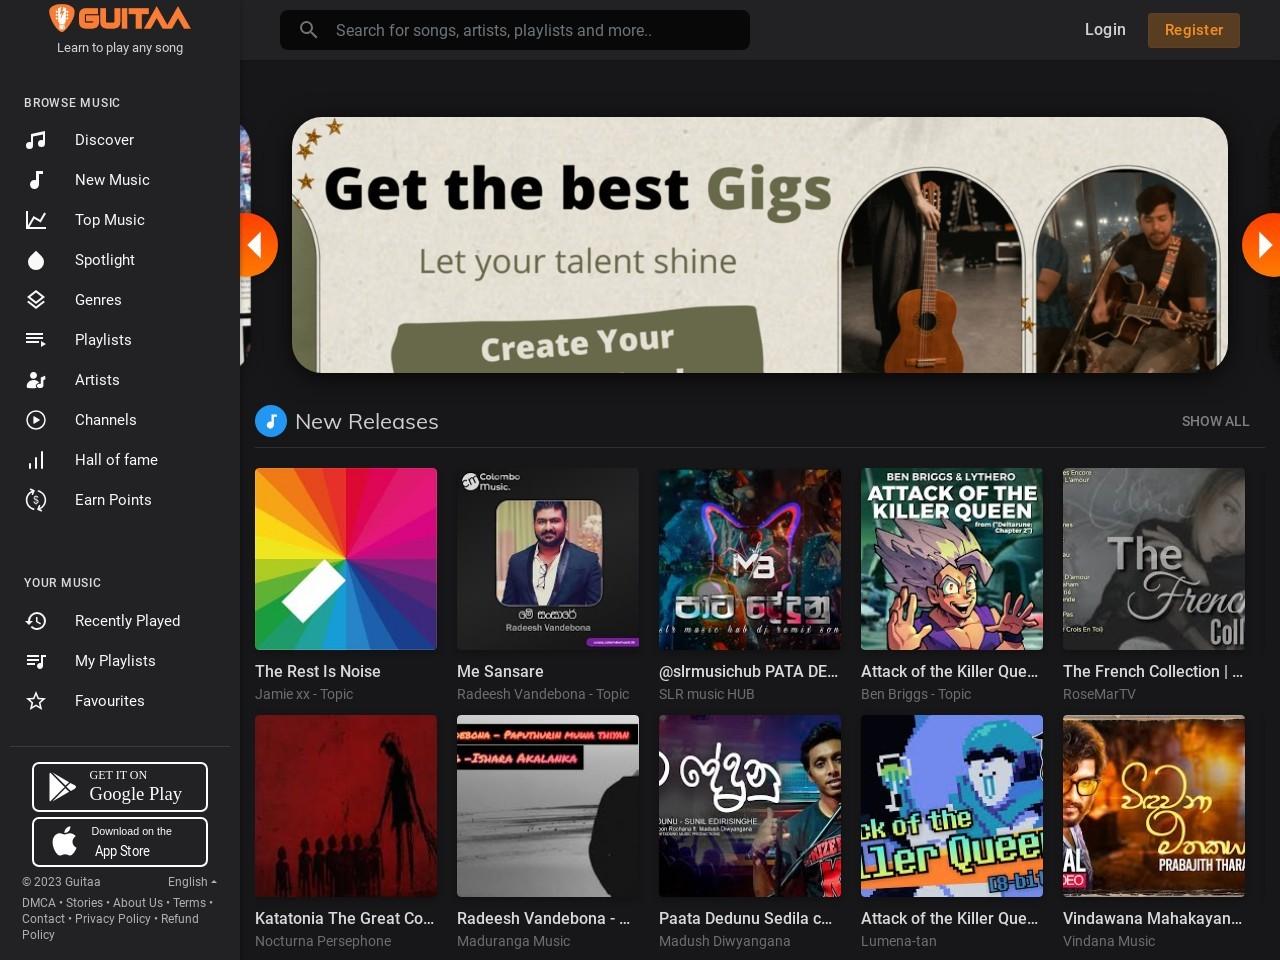 music chord forguitar,piano,ukulele